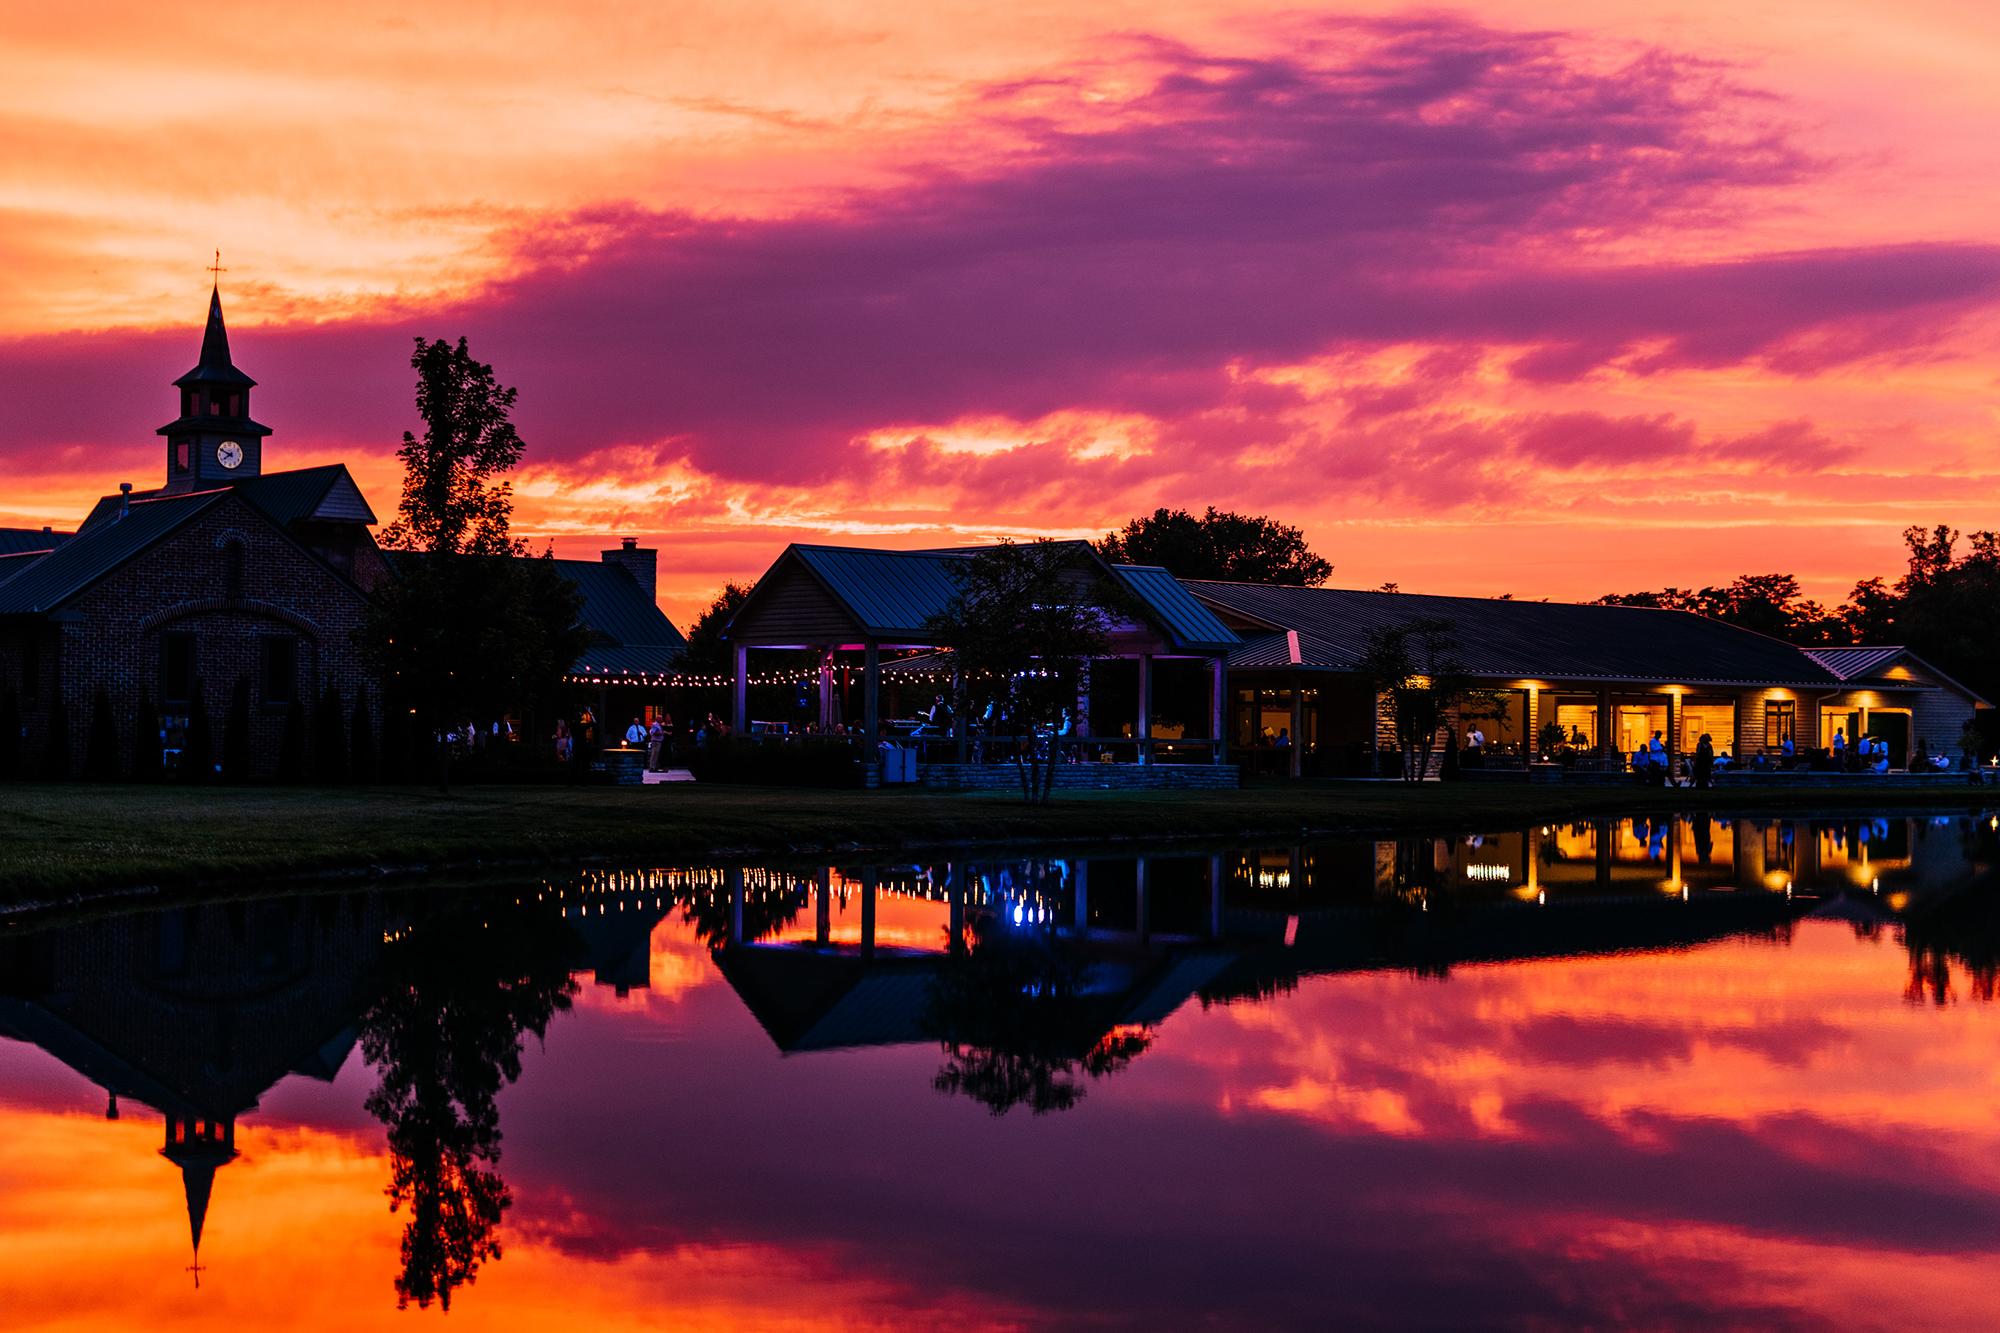 sunset at high acre farm piqua ohio